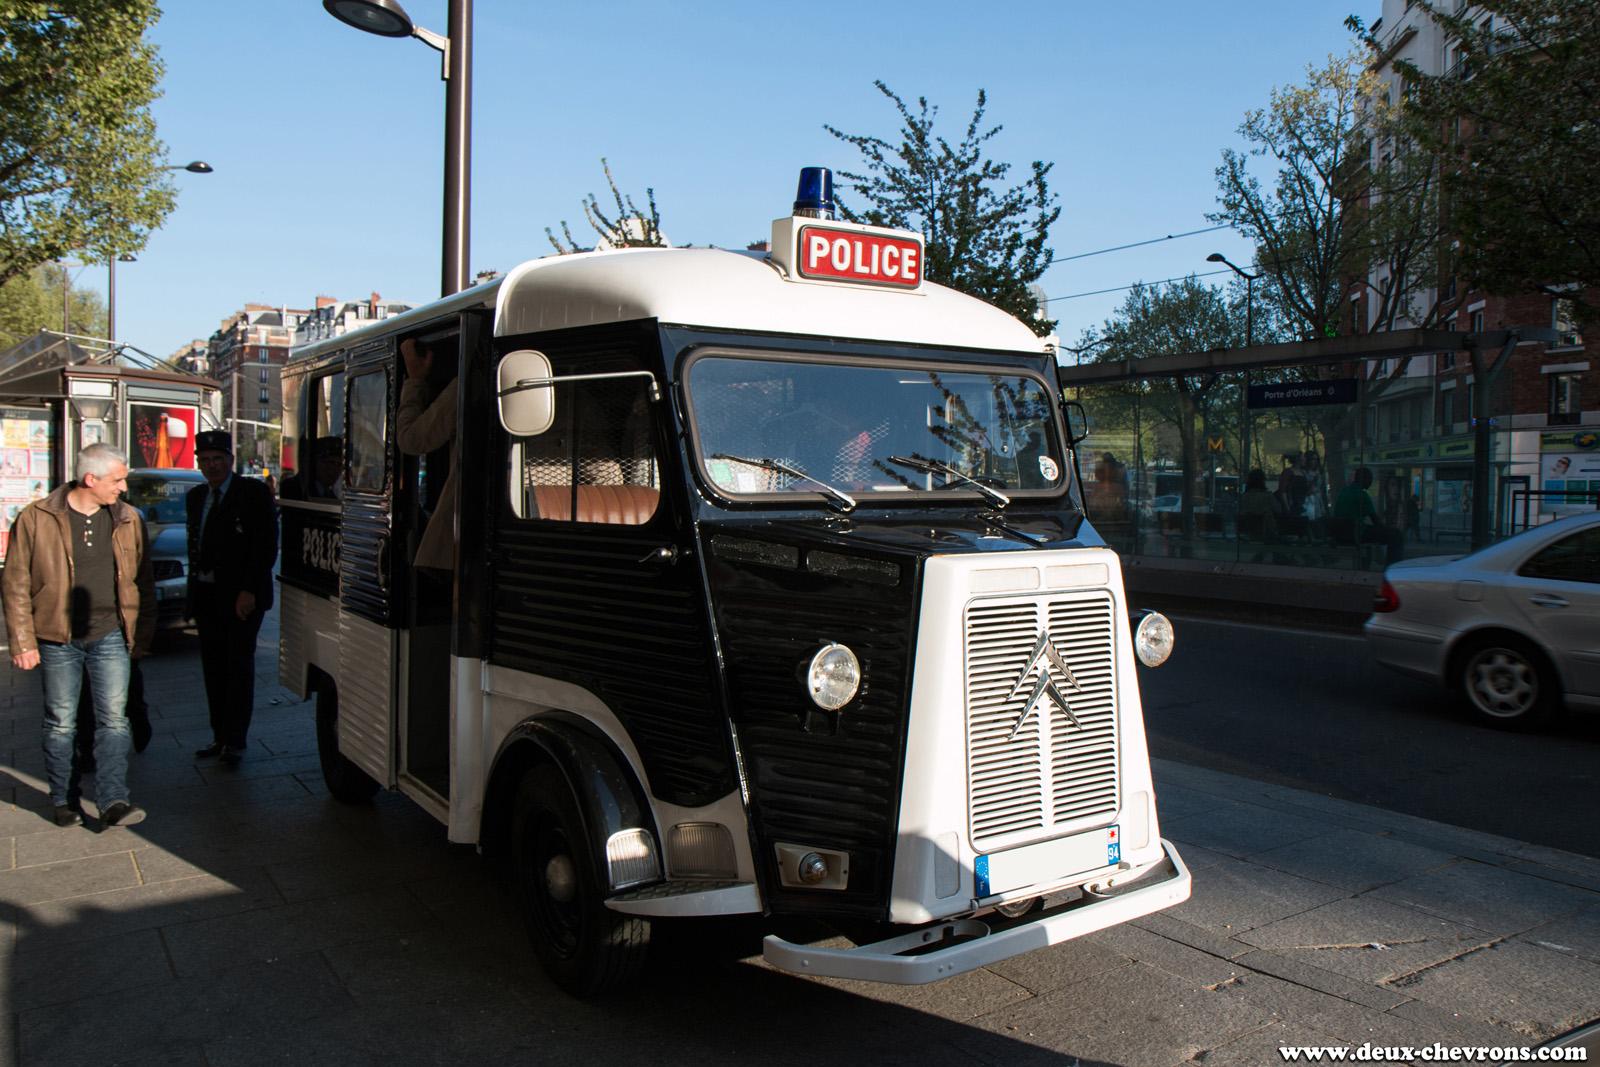 [SUJET OFFICIEL] Citroën SpaceTourer - Page 12 Spotting_2015_citroen_police_5